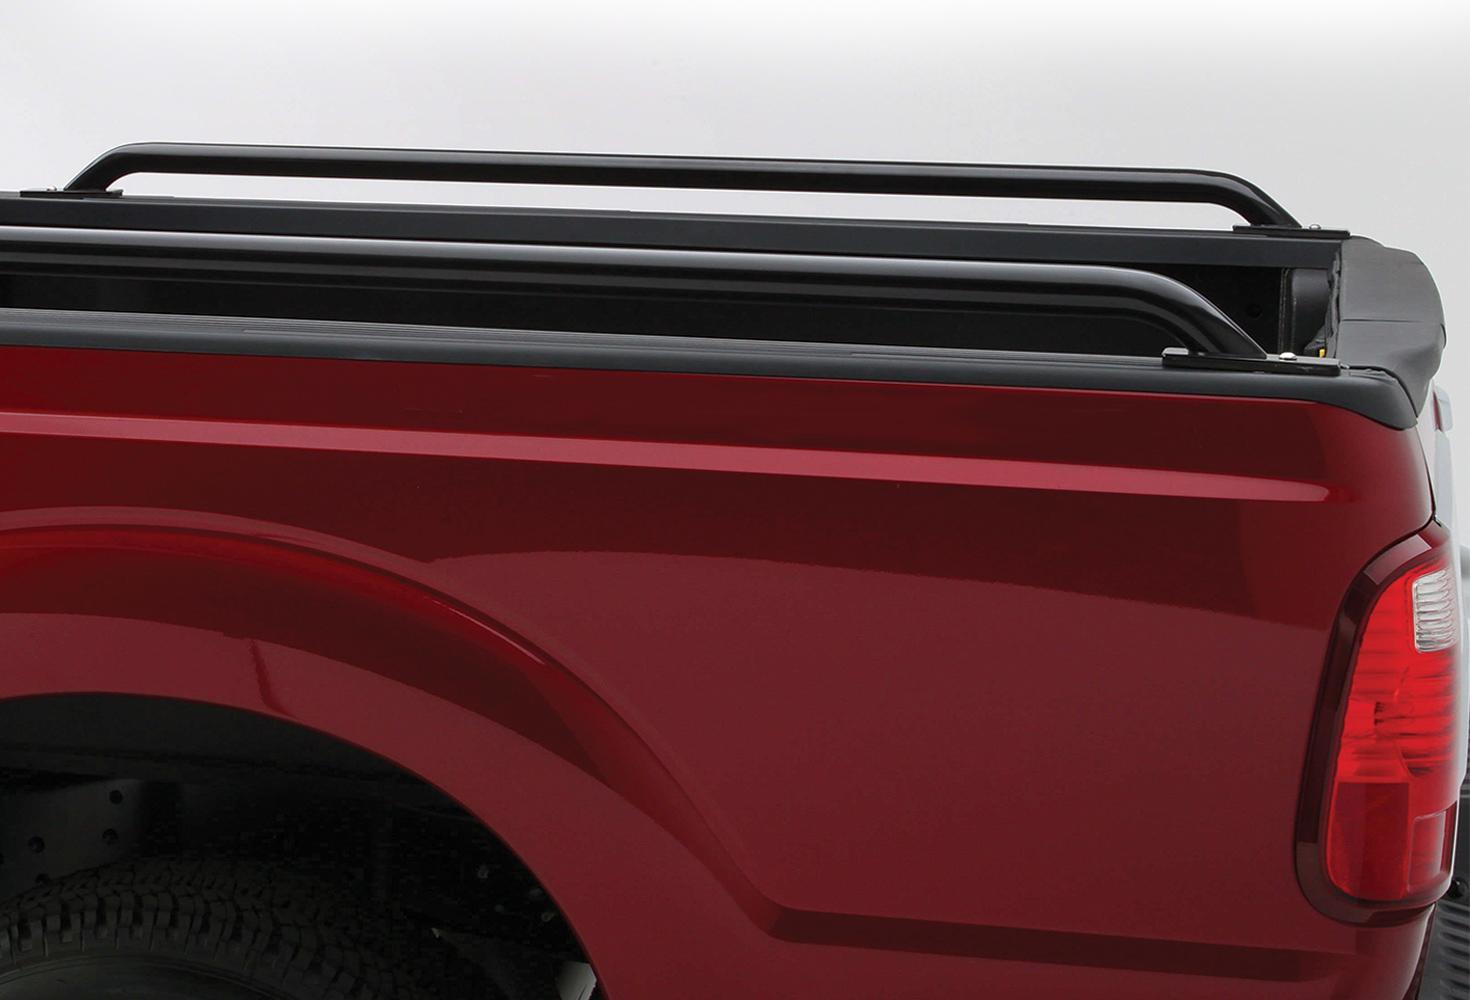 Bed Rails For Trucks 28 Images Ici Truck Bed Rails Shop Realtruck Com Go Rhino Universal